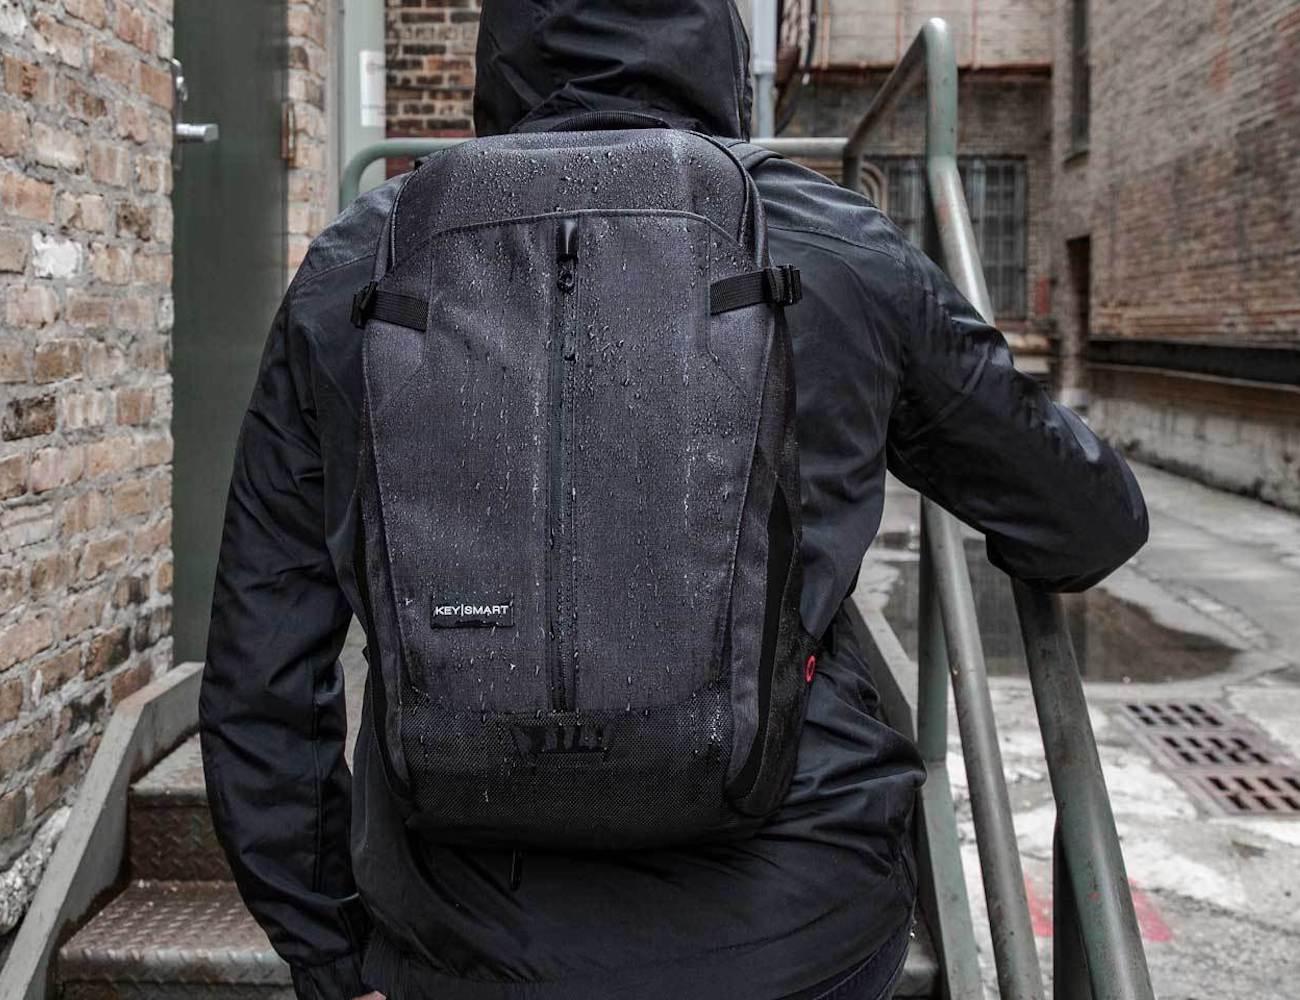 KeySmart Urban21 Premium Commuter Backpack